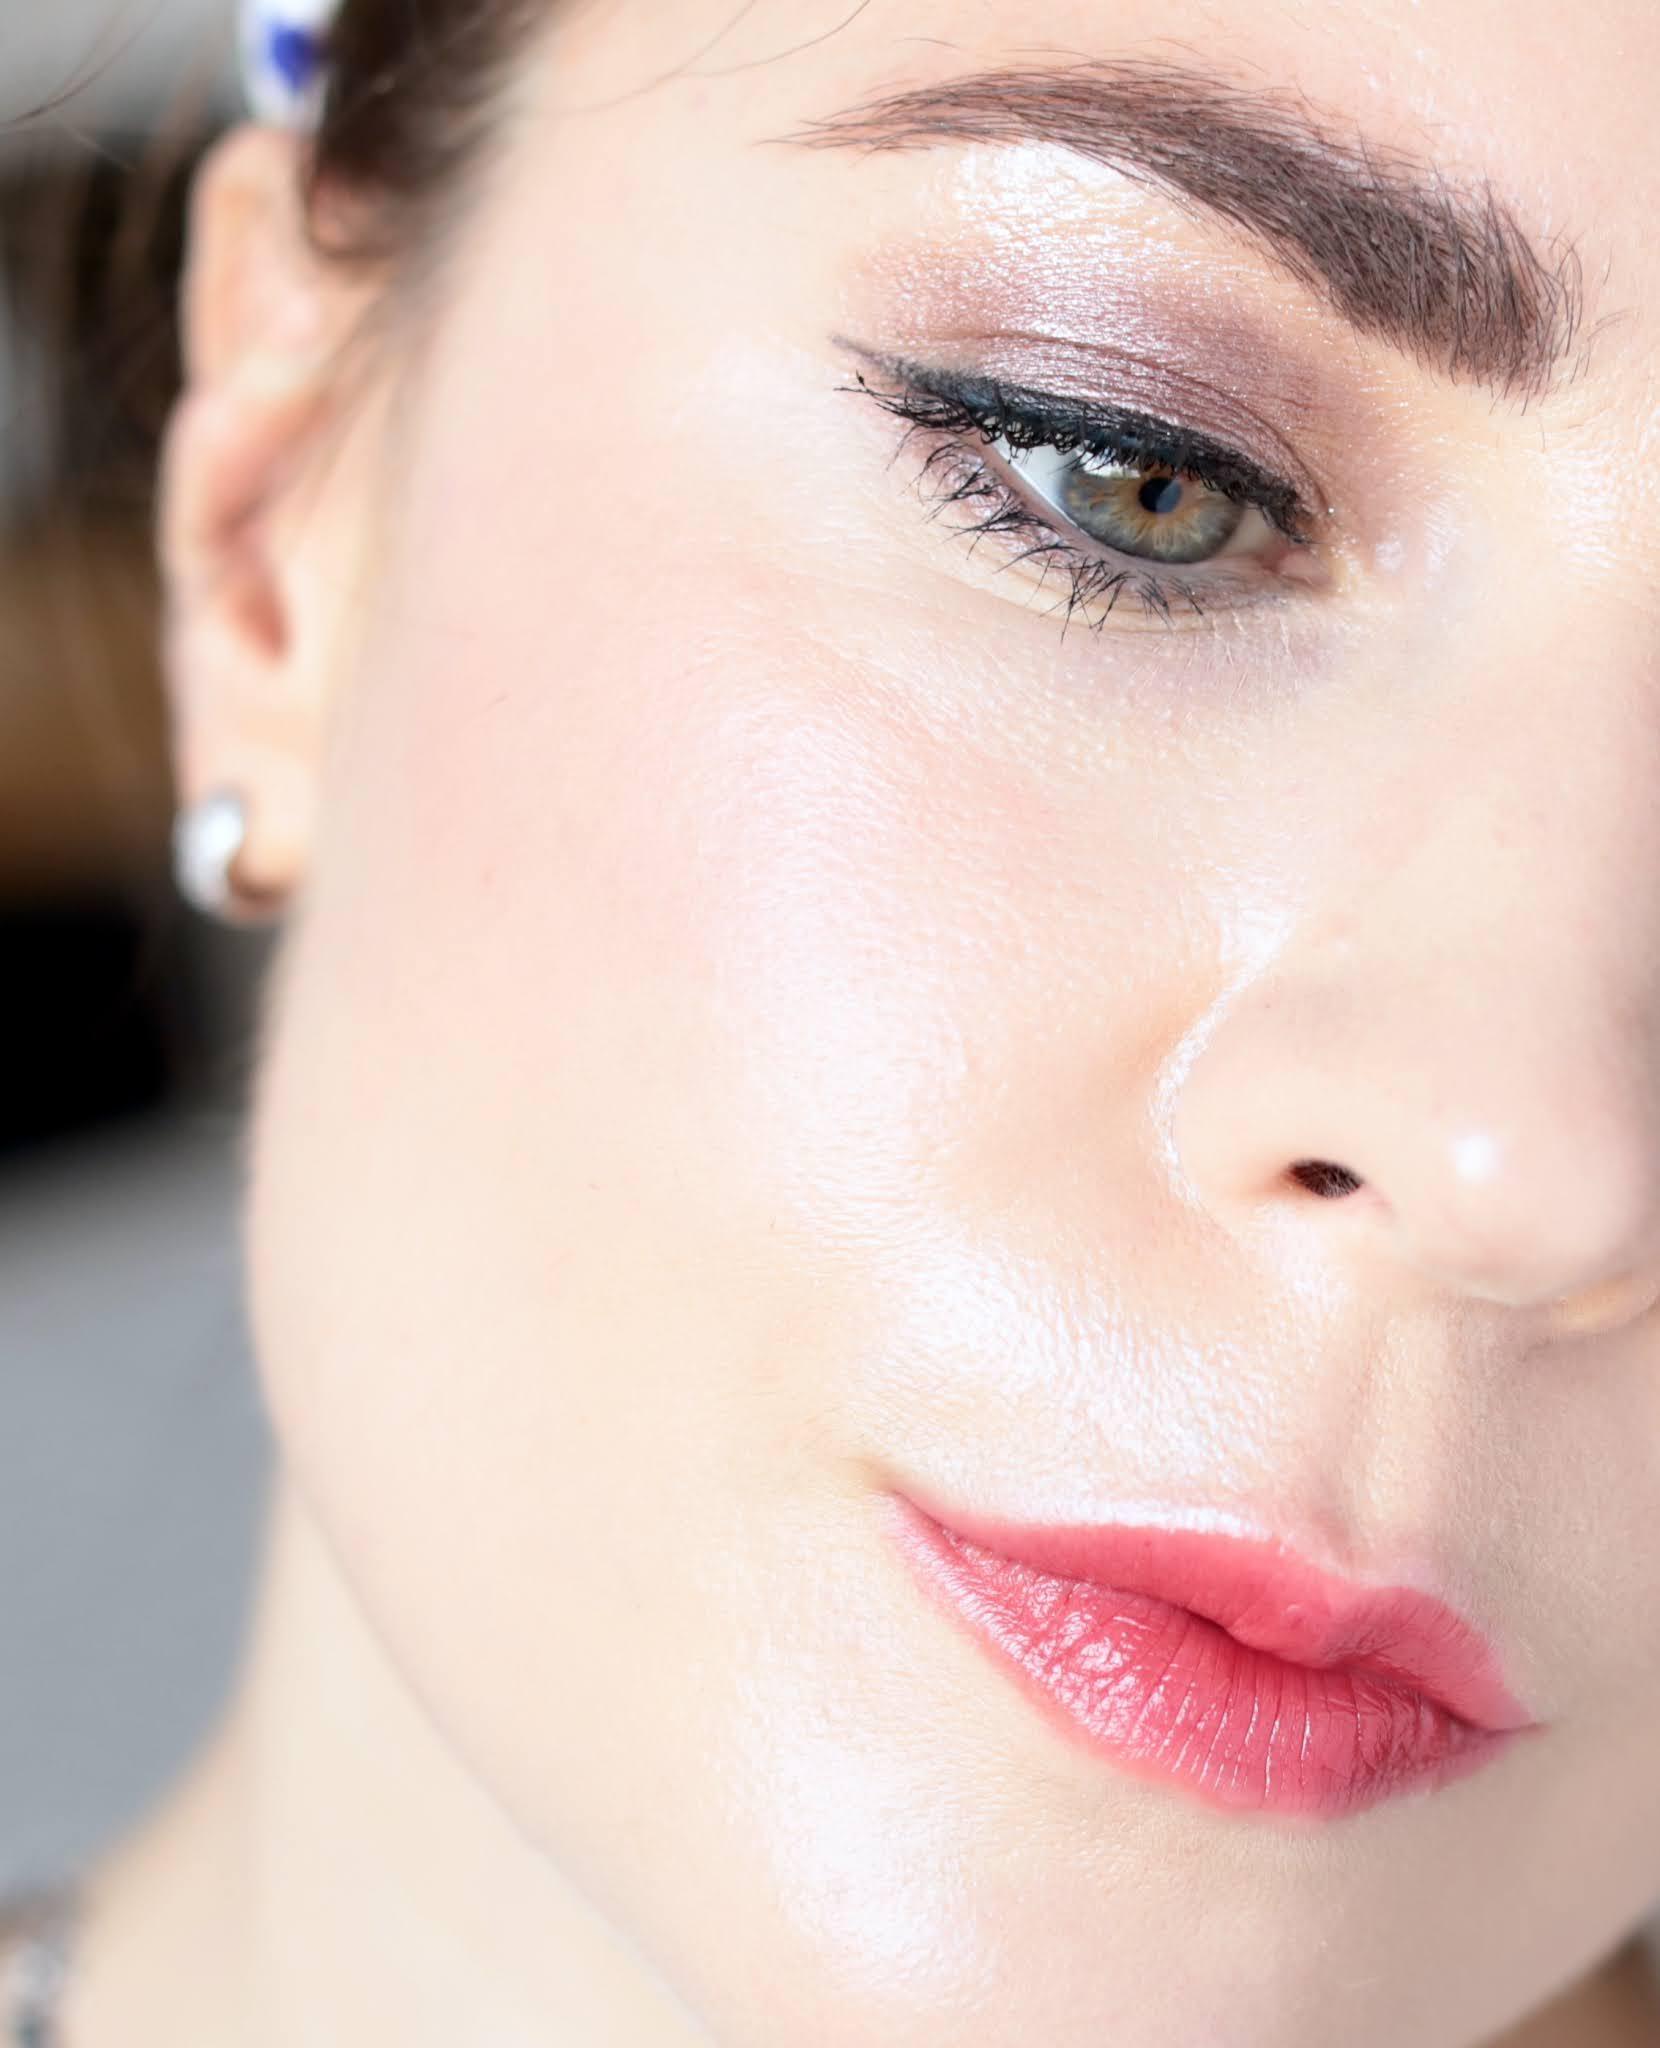 Shiseido Pop Powdergel fard à paupières 08 suru suru taupe 02 horo horo silk